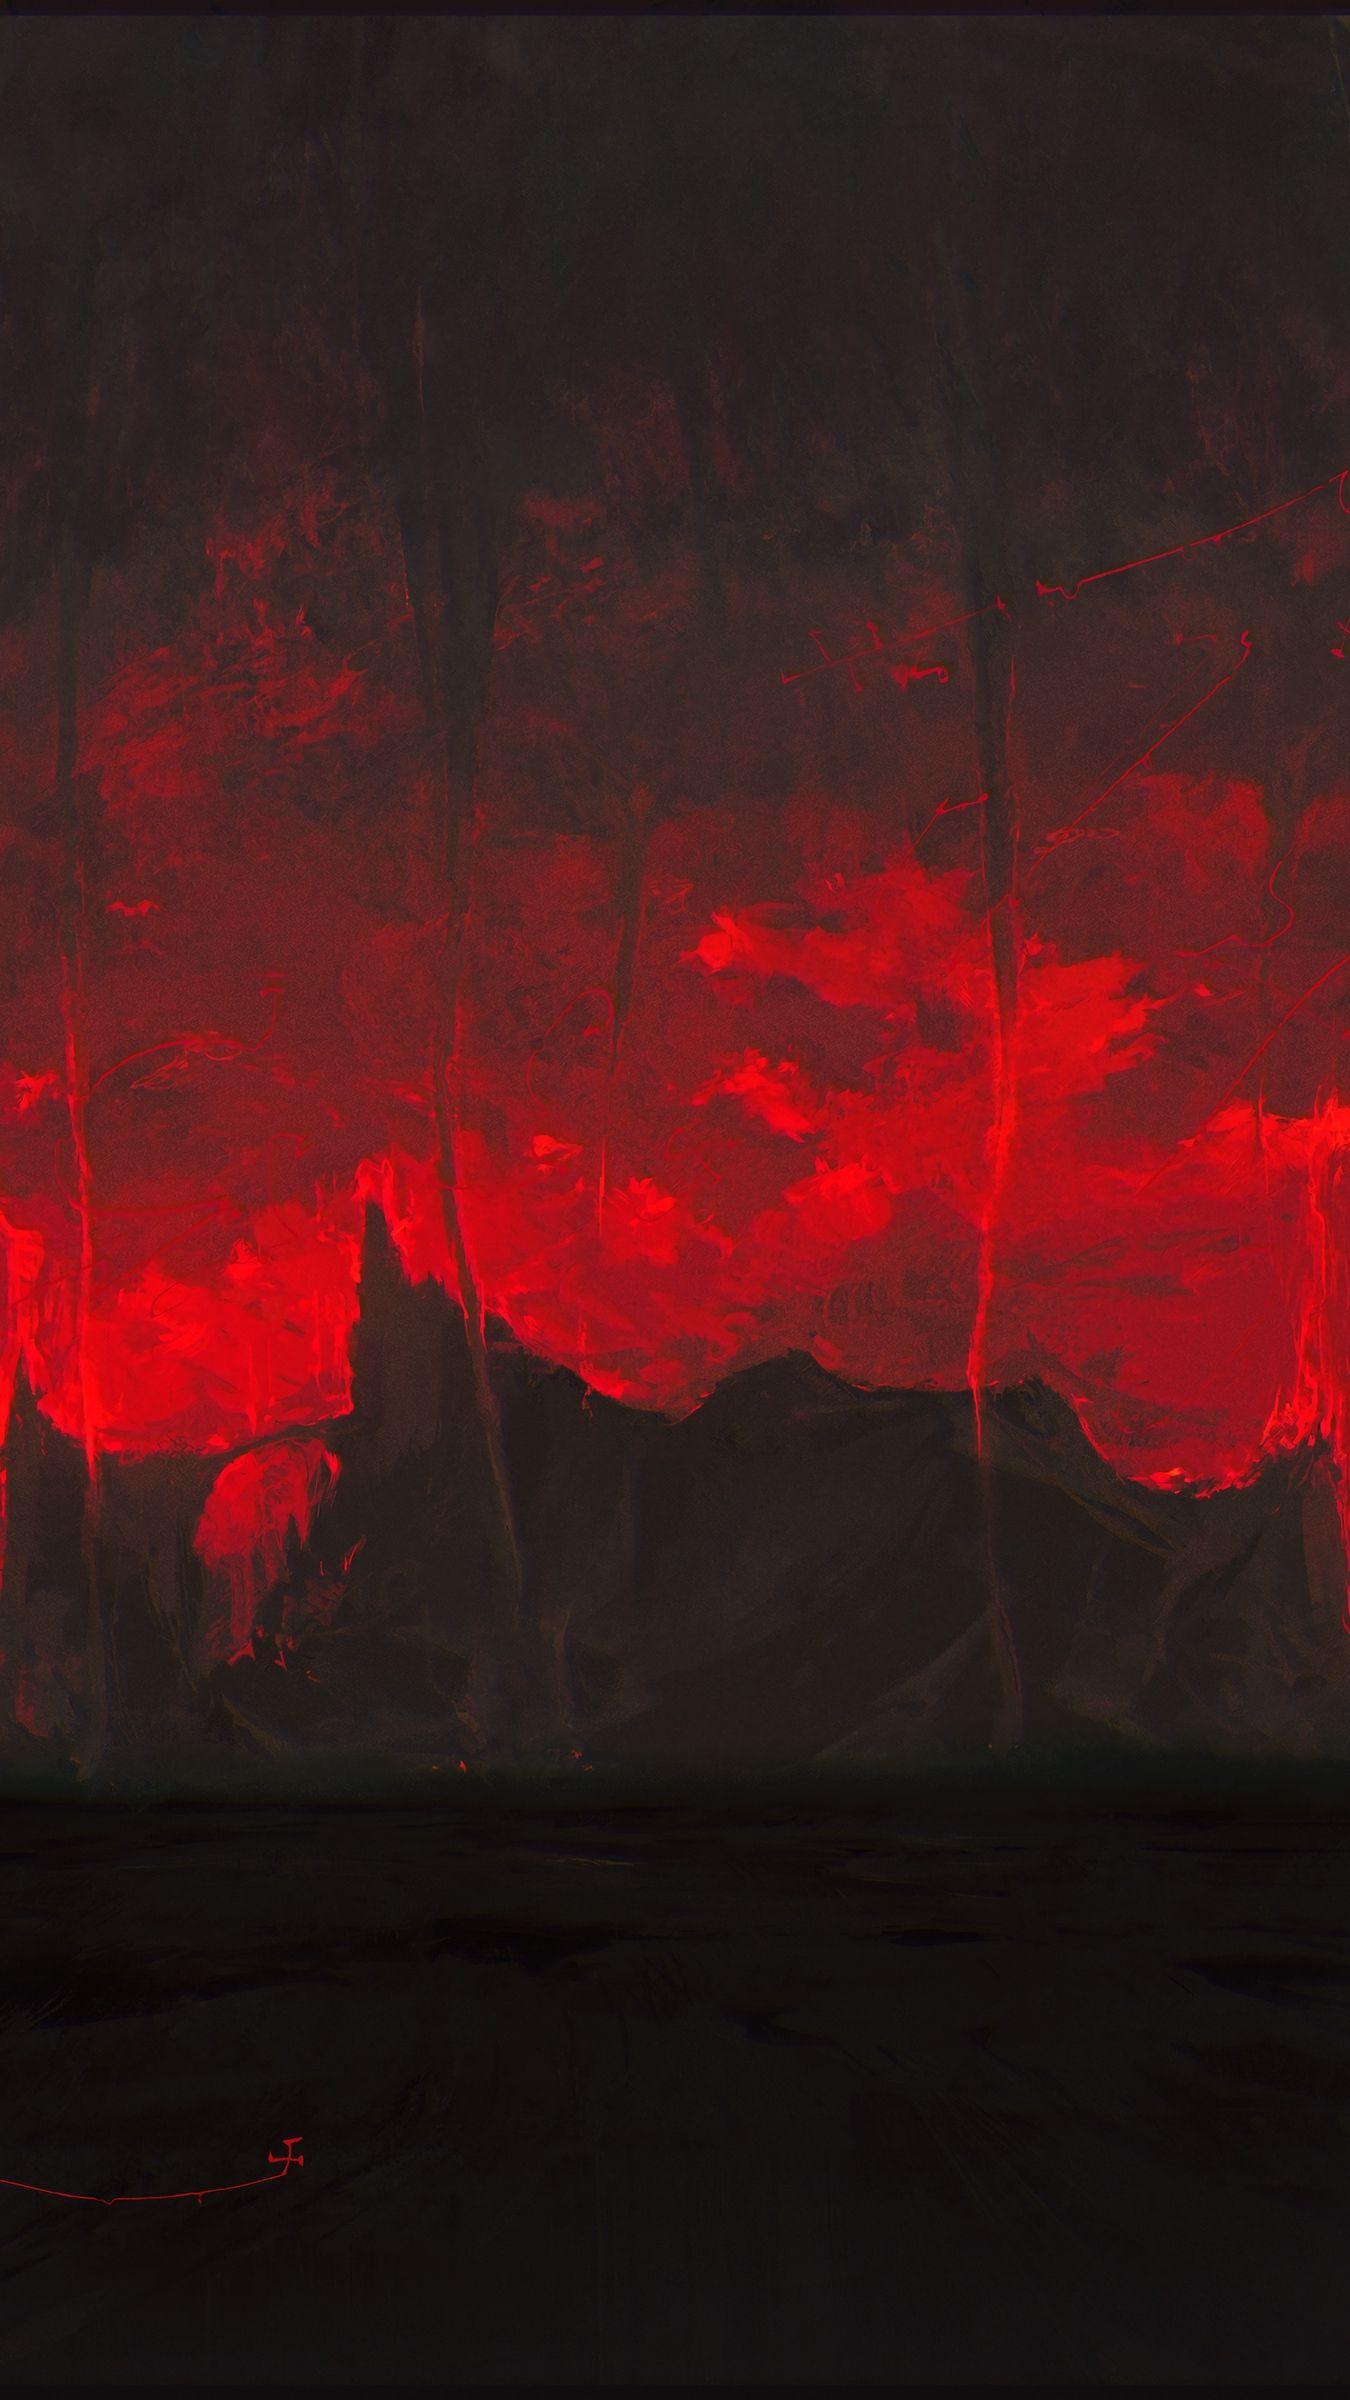 Dark Art Iphone Wallpapers Top Free Dark Art Iphone